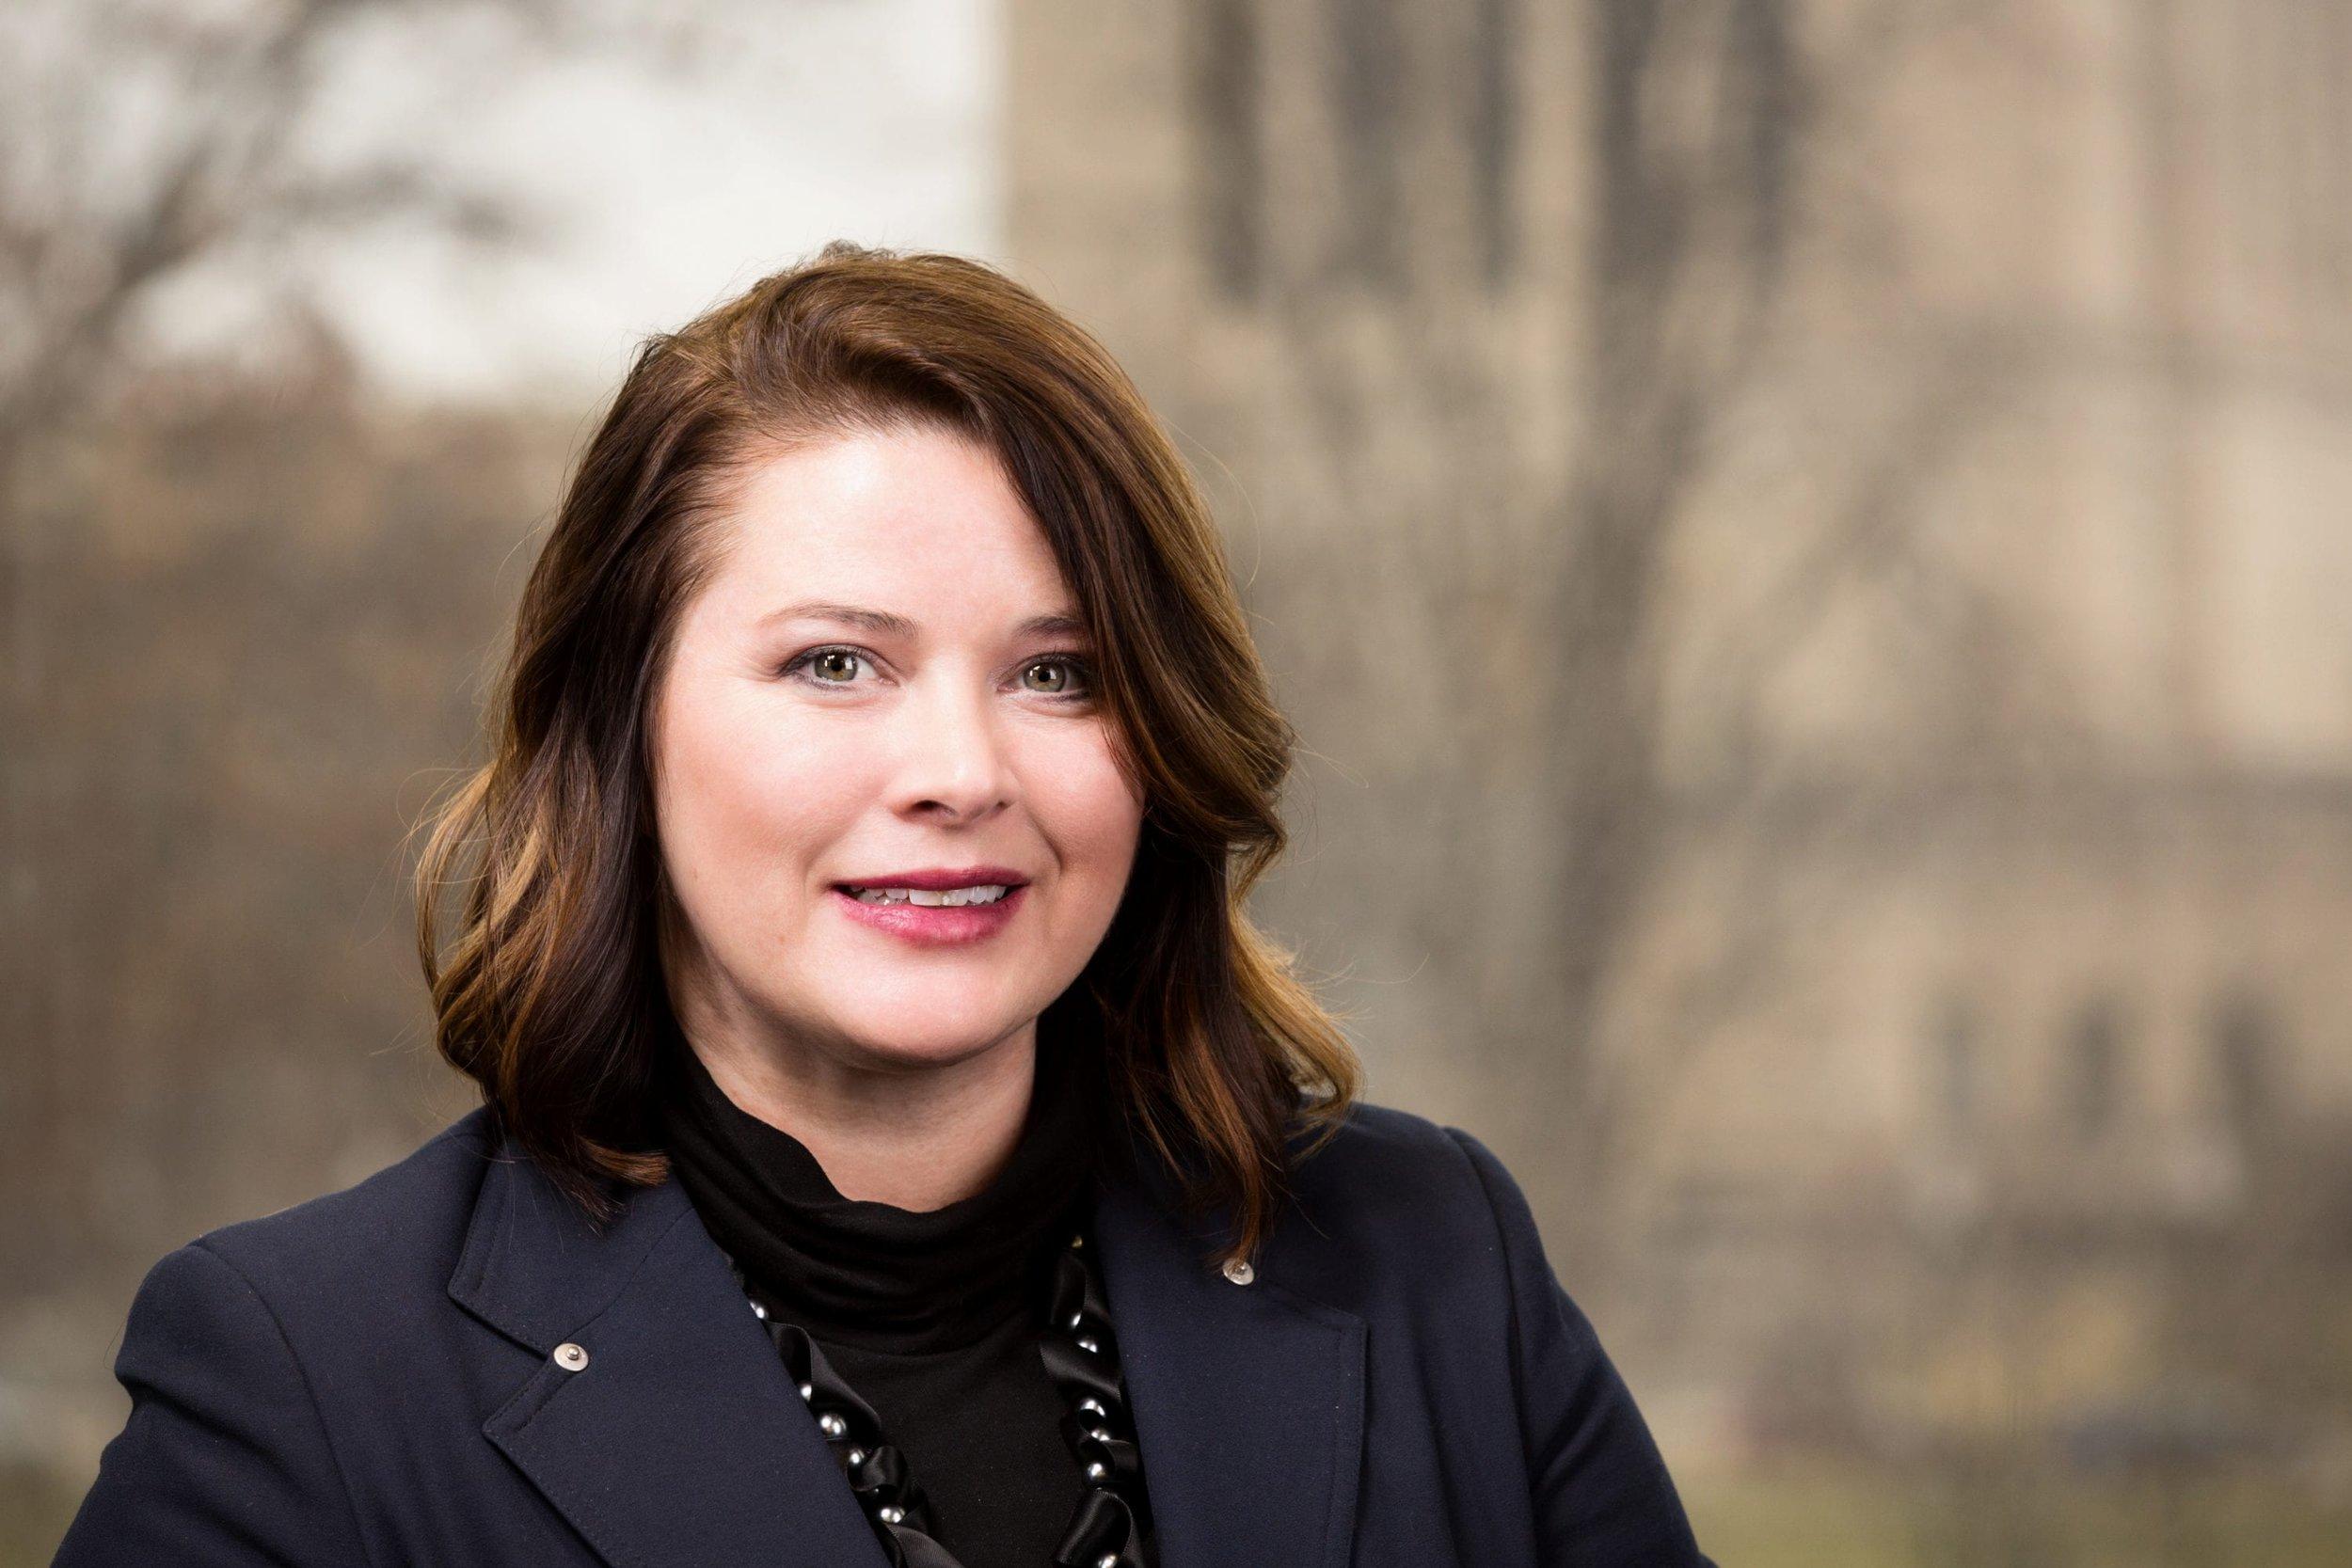 Amanda Fishburn, Vice President of Ignition Inc. -